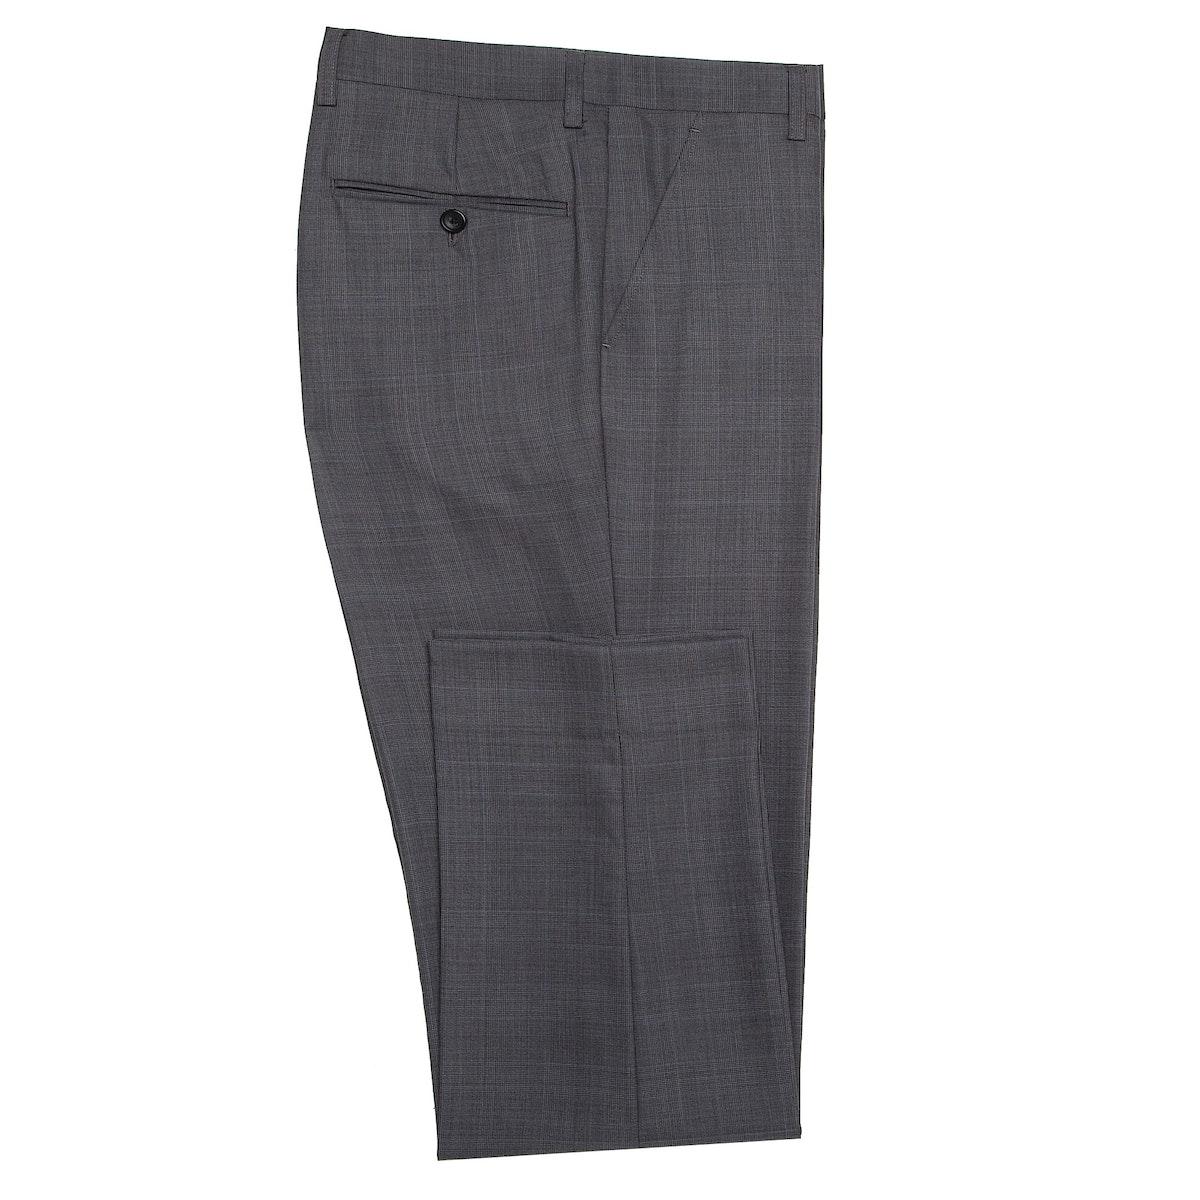 InStitchu Collection Carnwath Grey Glen Plaid Wool Pants